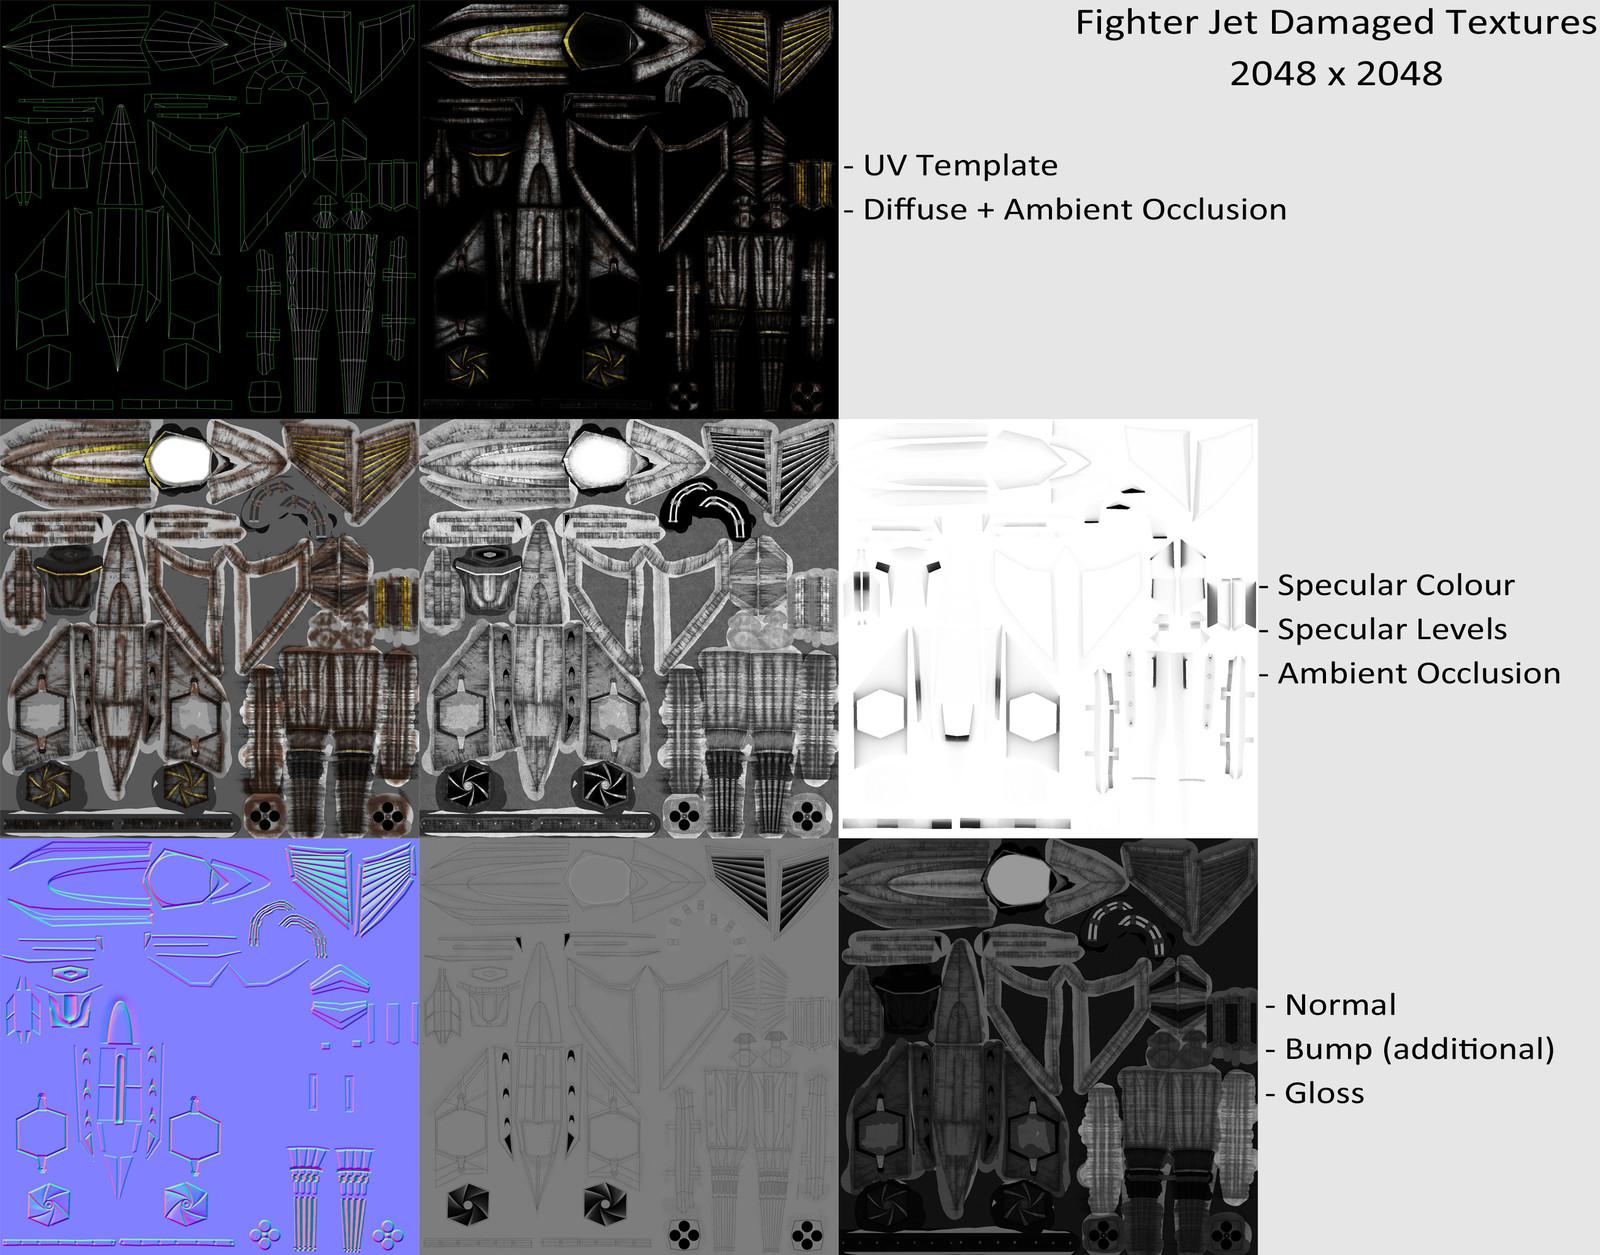 Texture Maps Damaged